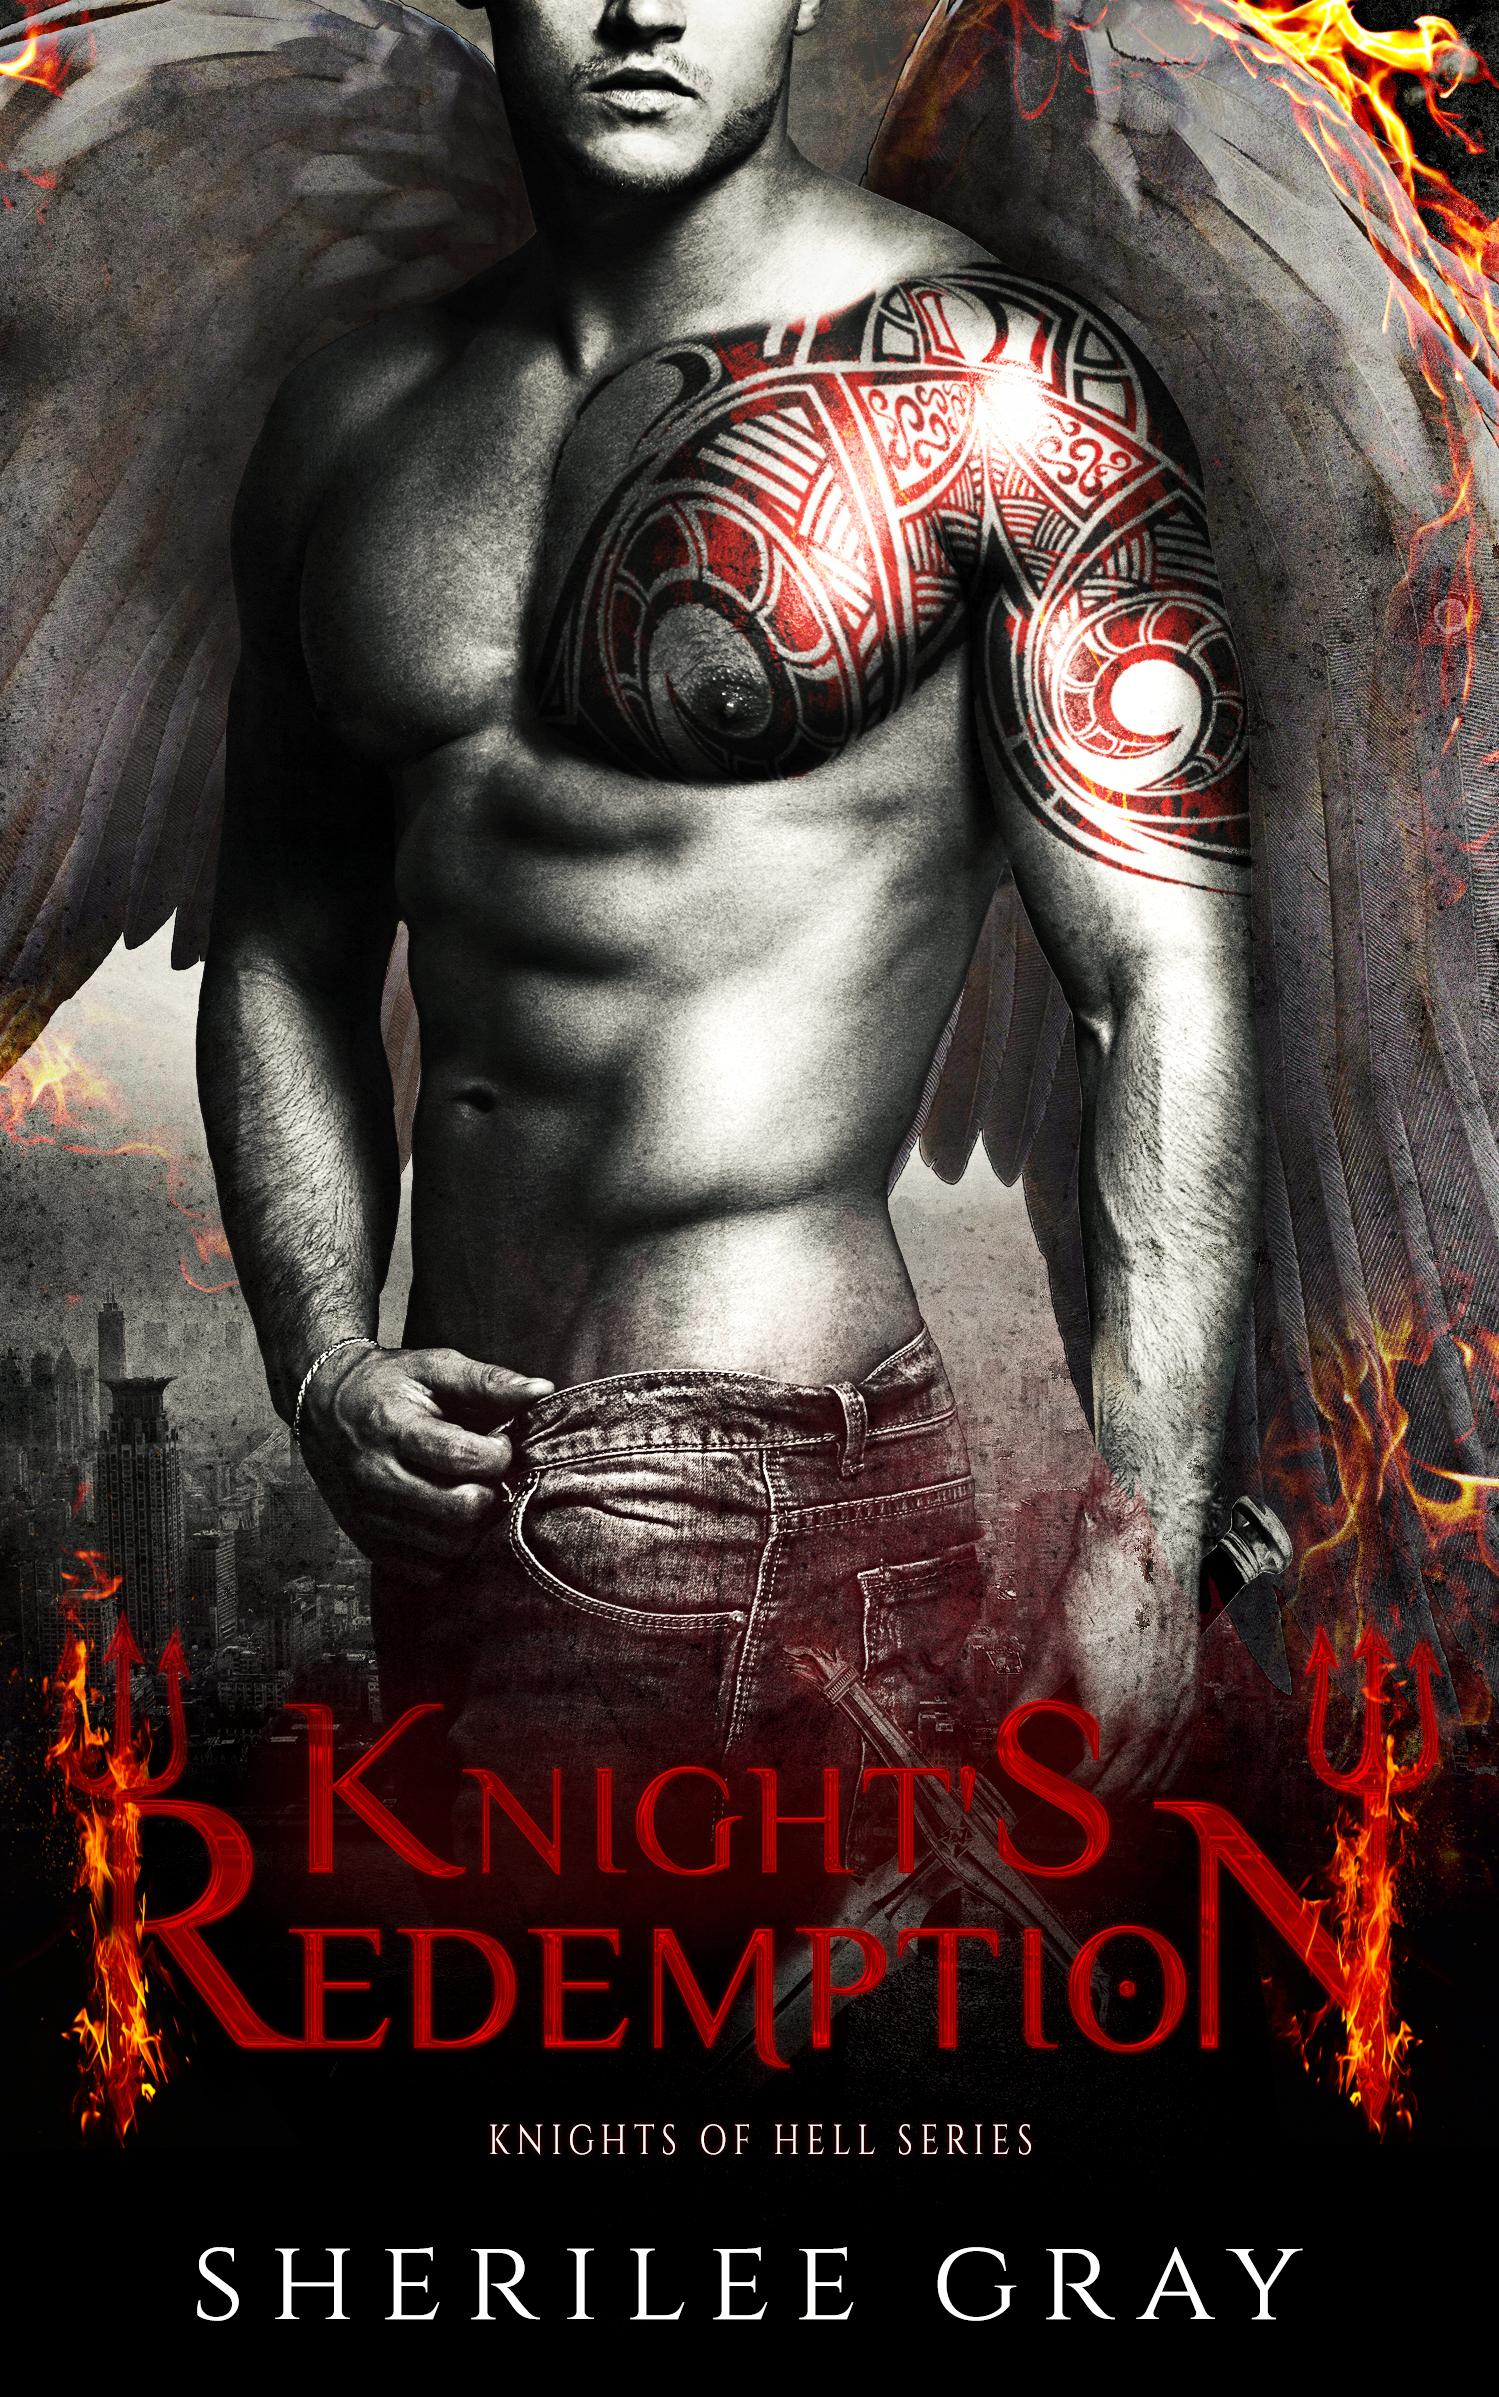 Knight's Redemption (sst-cccxxxix)